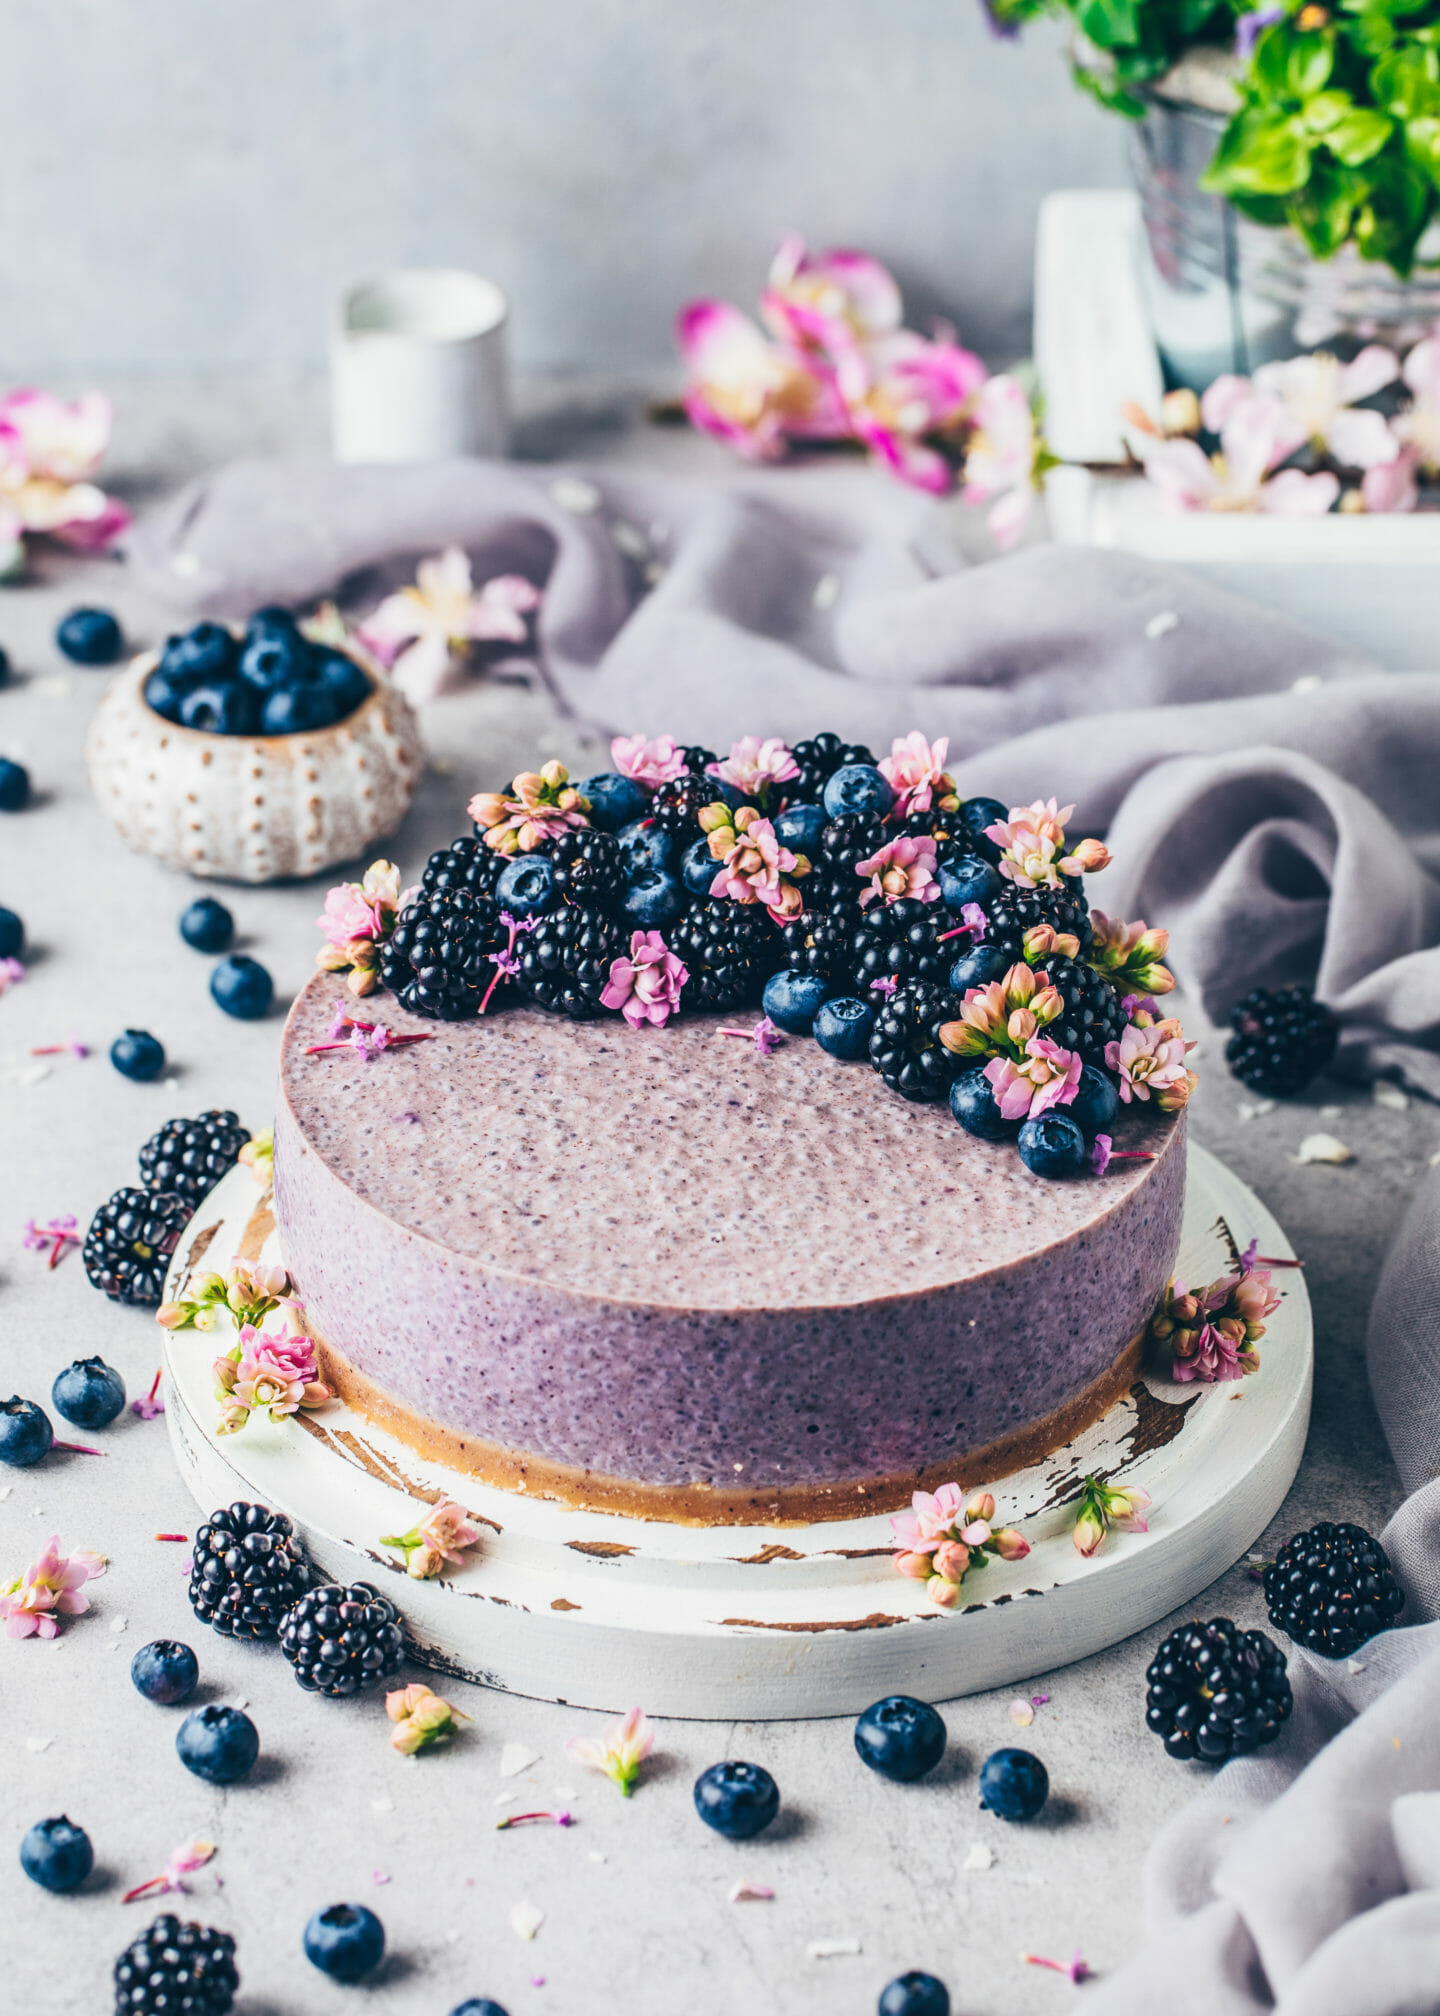 Blueberry Chia Joghurt Torte (Food Fotografie)